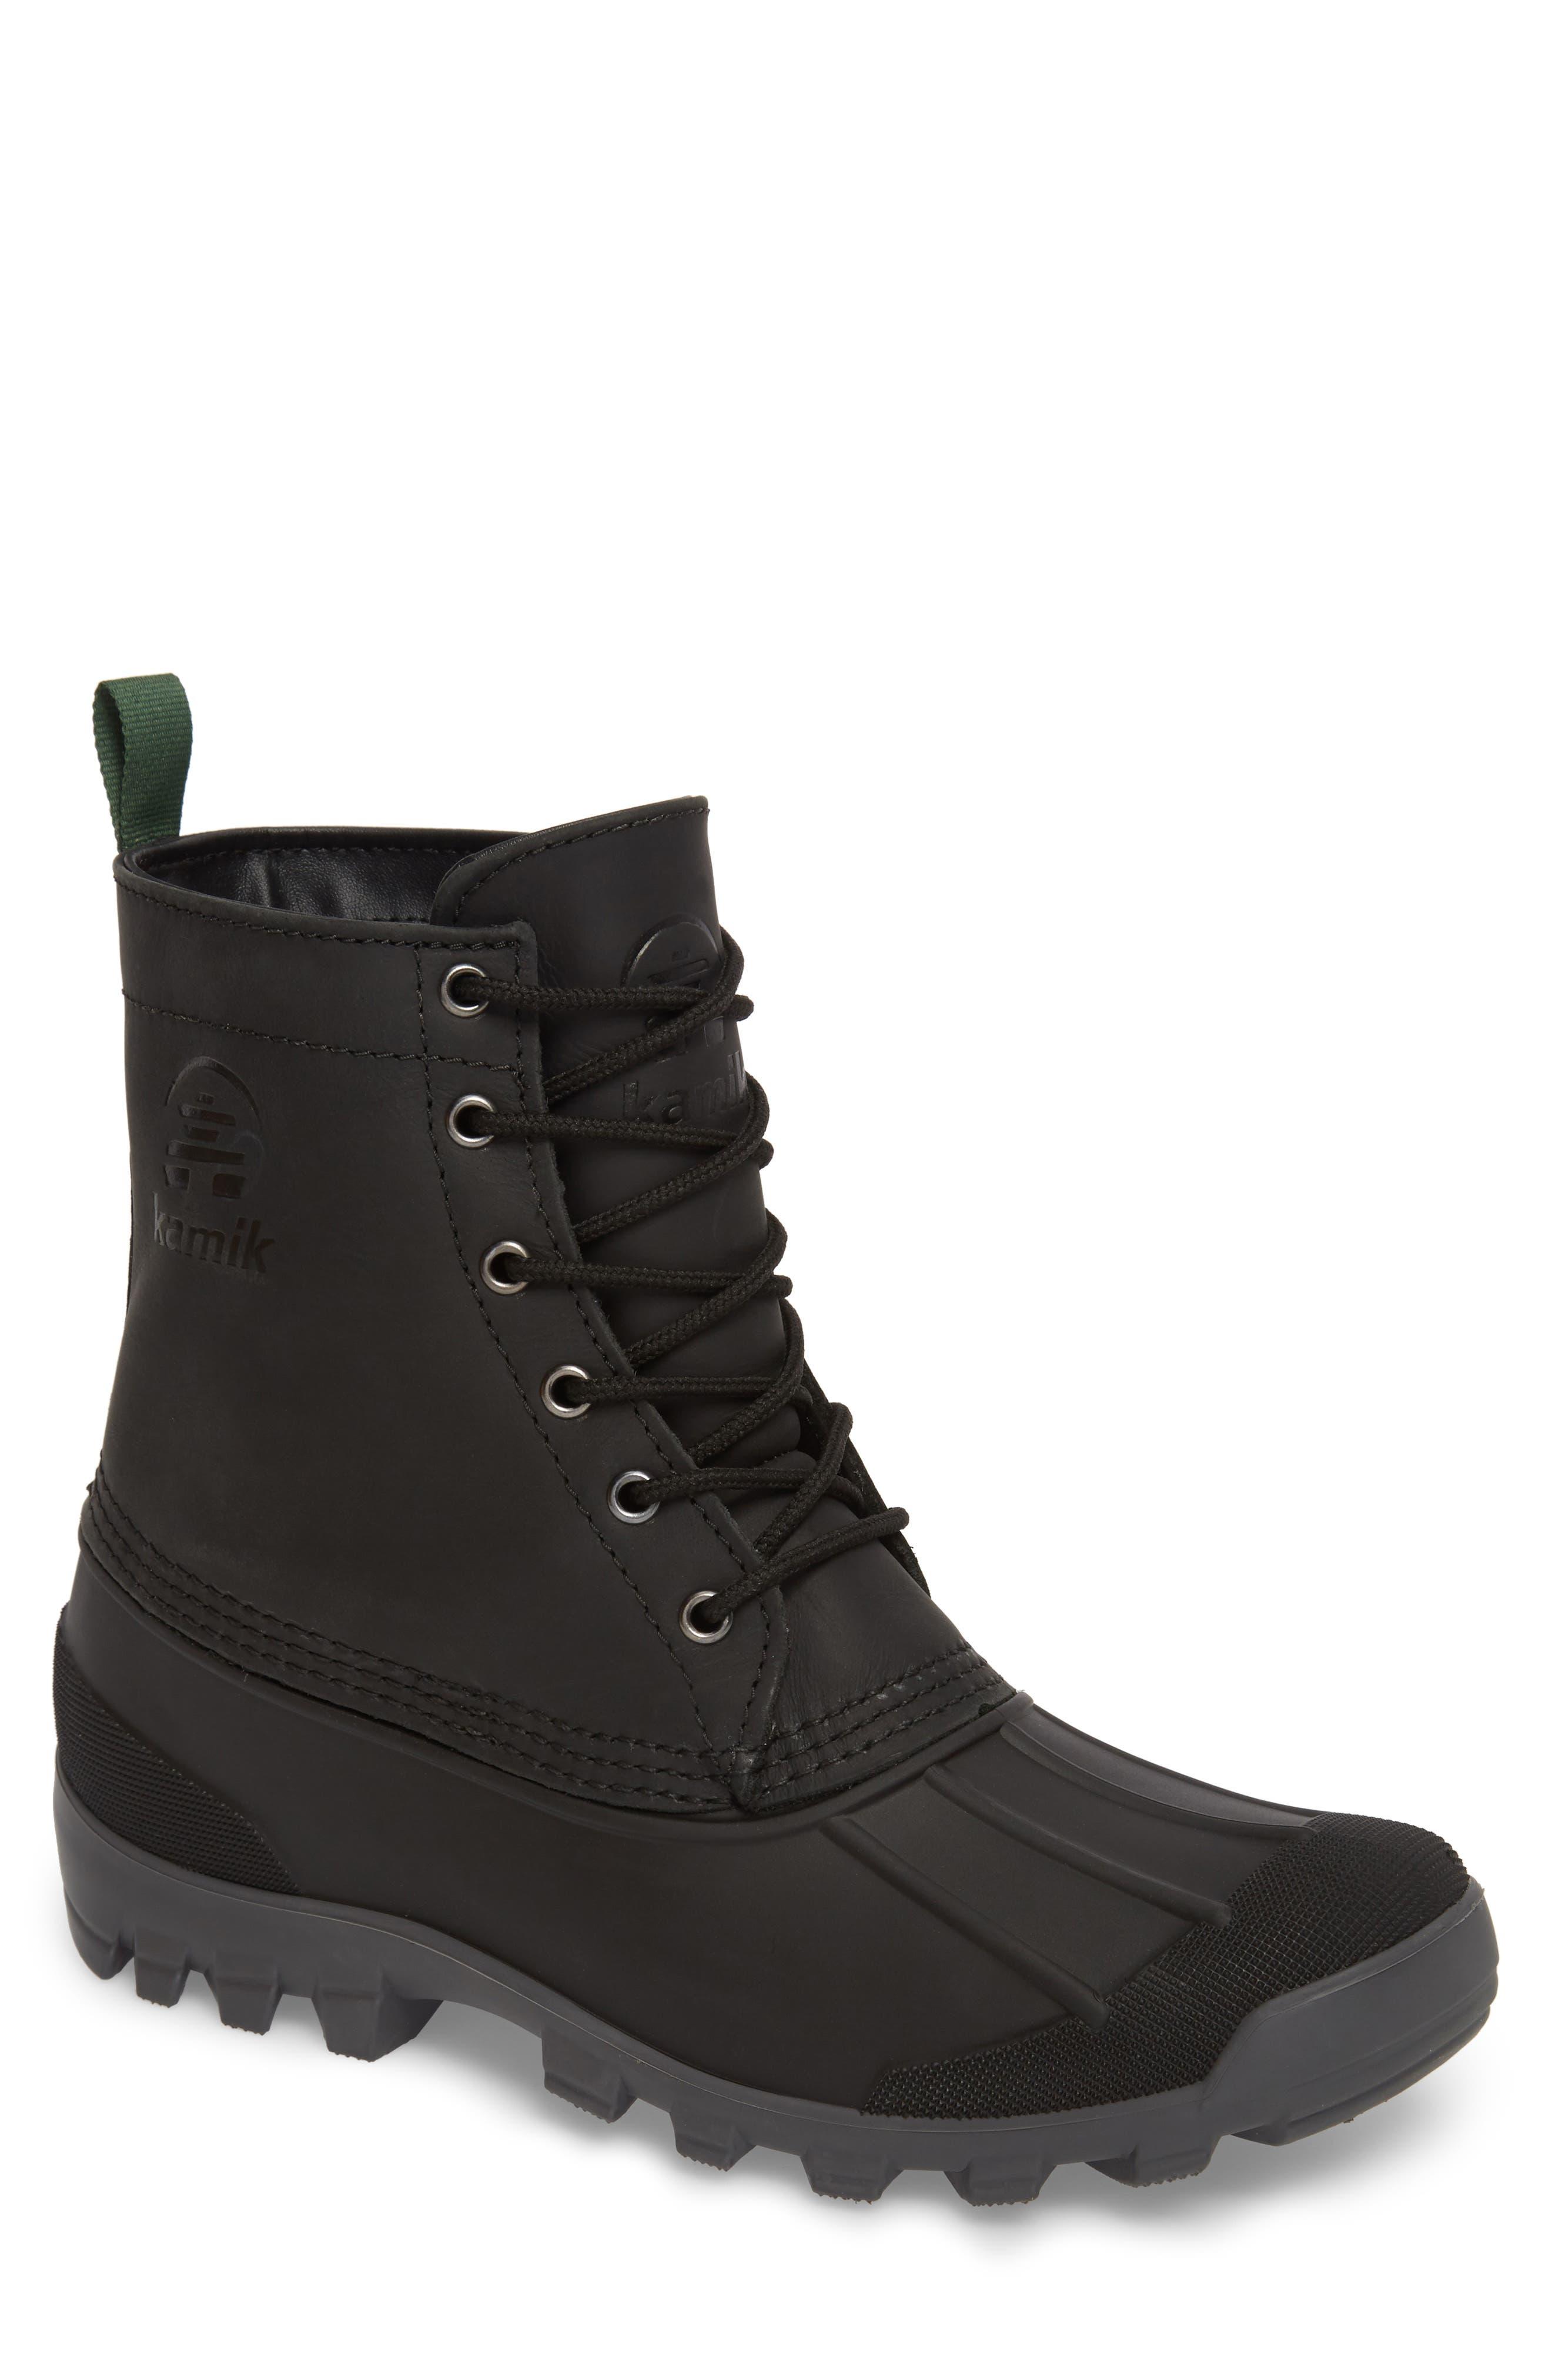 Yukon 6 Waterproof Insulated Three-Season Boot,                         Main,                         color, 001